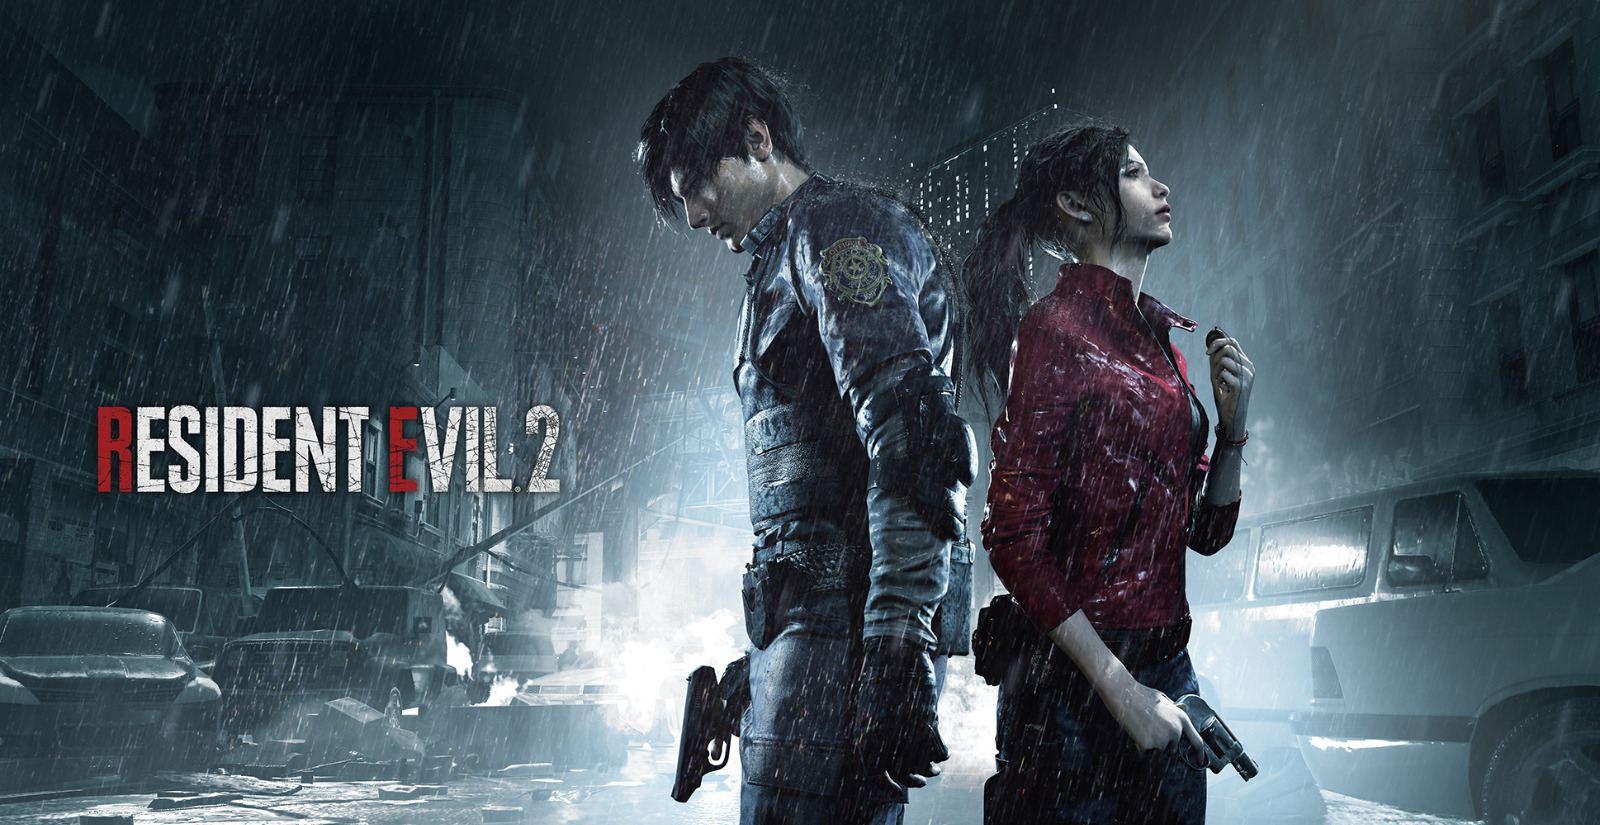 Resident Evil 2 2019 Walkthrough And Guide Neoseeker